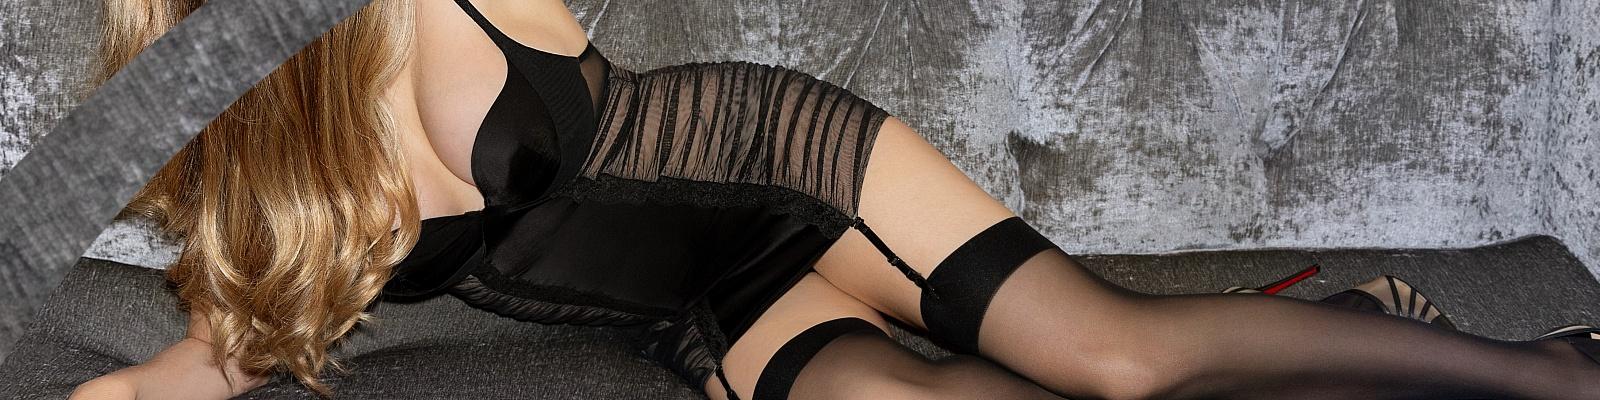 Liv Klein's Cover Photo